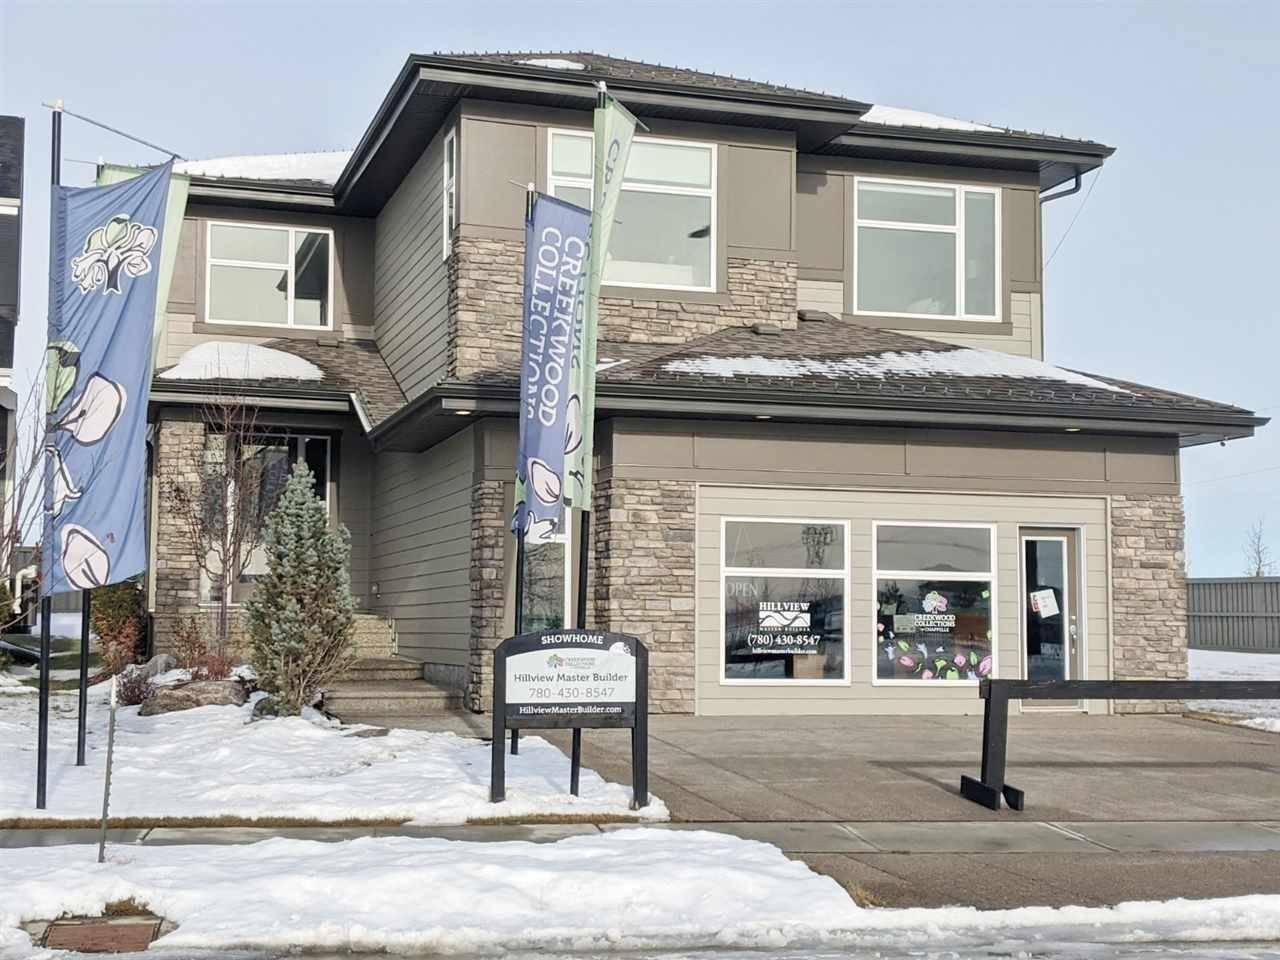 House for sale at 4691 Chegwin Wd Sw Edmonton Alberta - MLS: E4176749